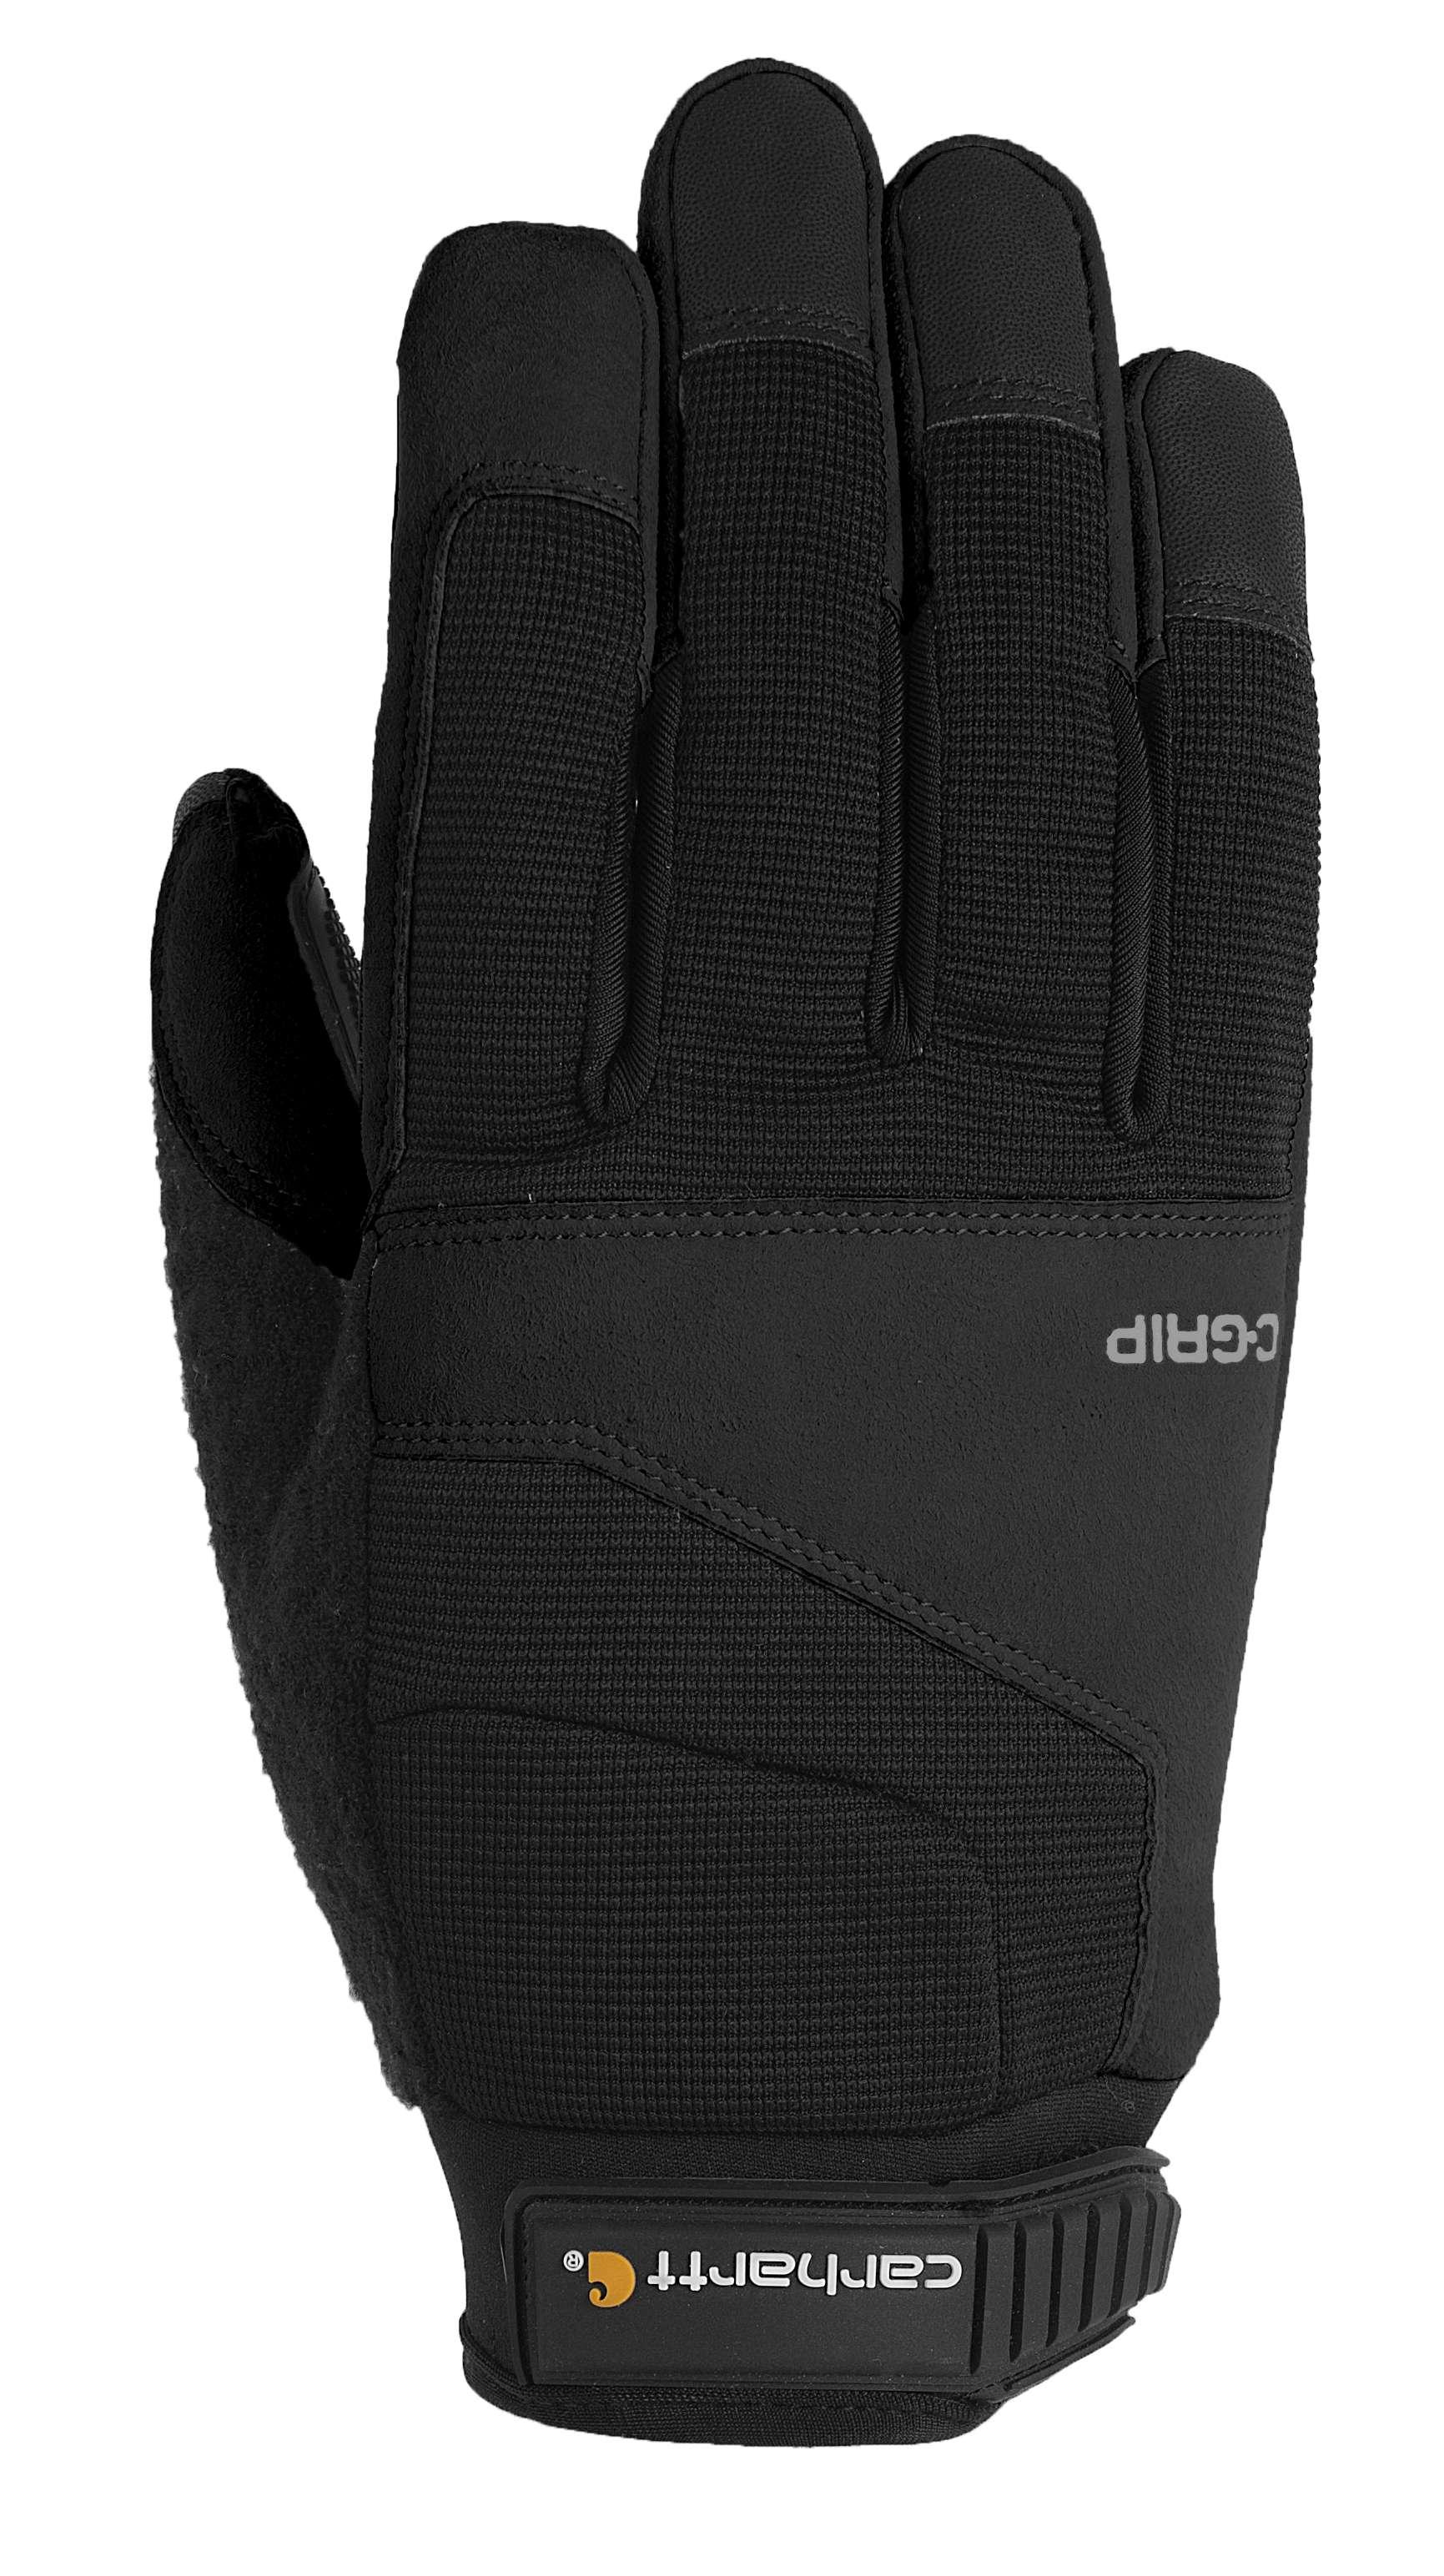 carhartt c-grip tri-grip glove black 2xl